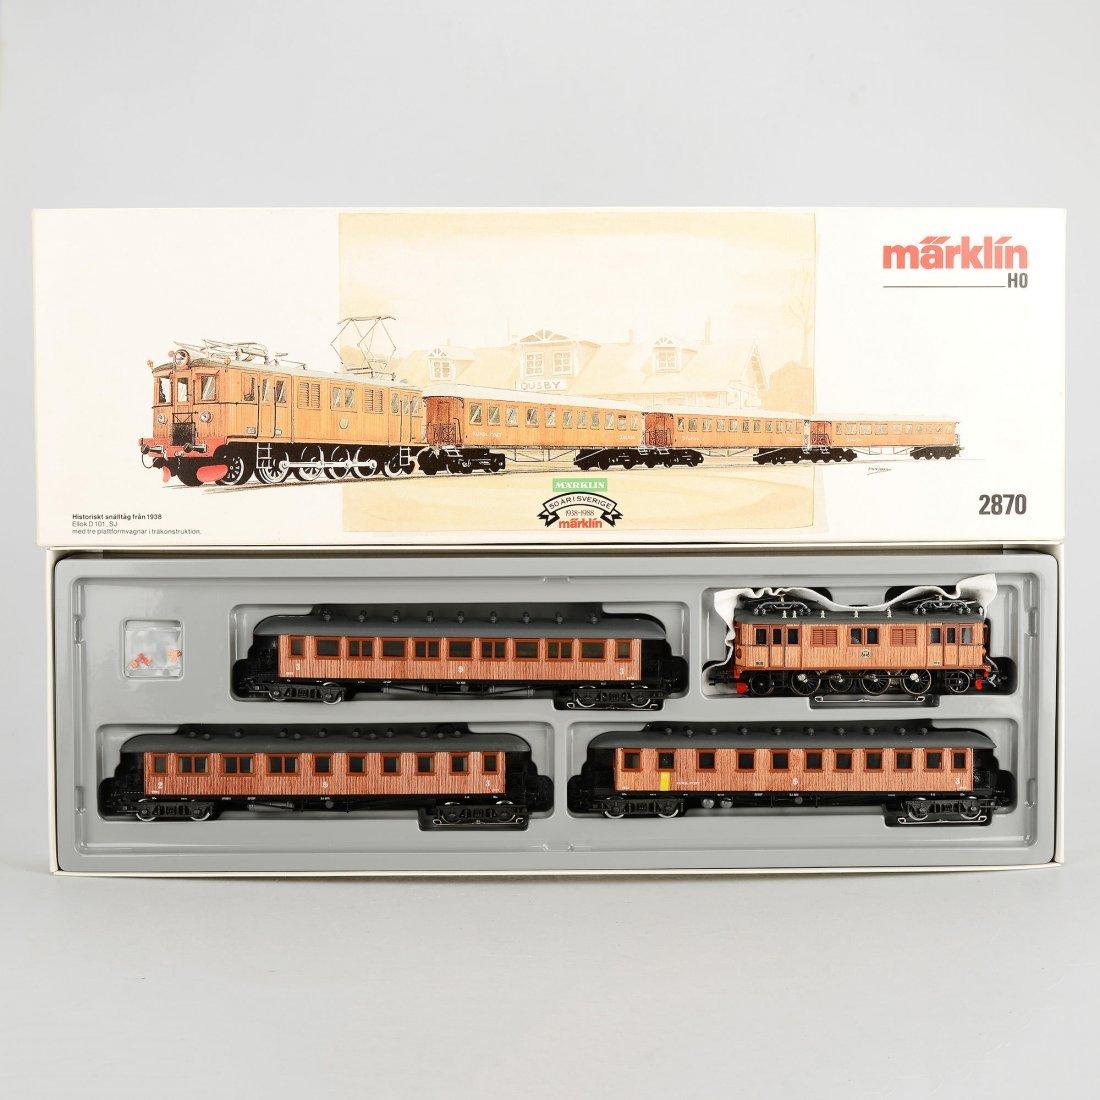 TAGSATS, 2870, Marklin, H0